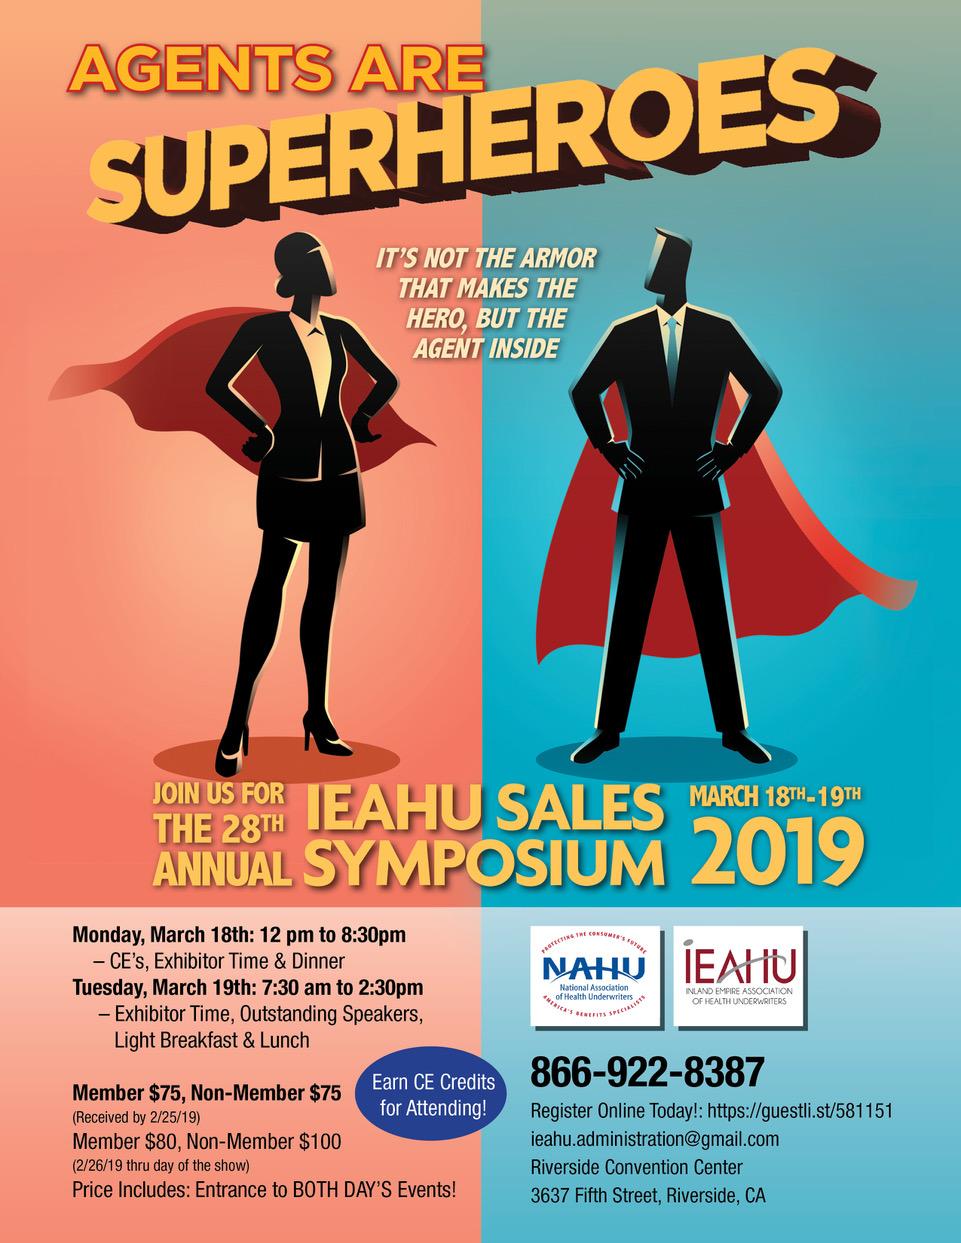 IEAHU_Superheroes_Flyer_Rev